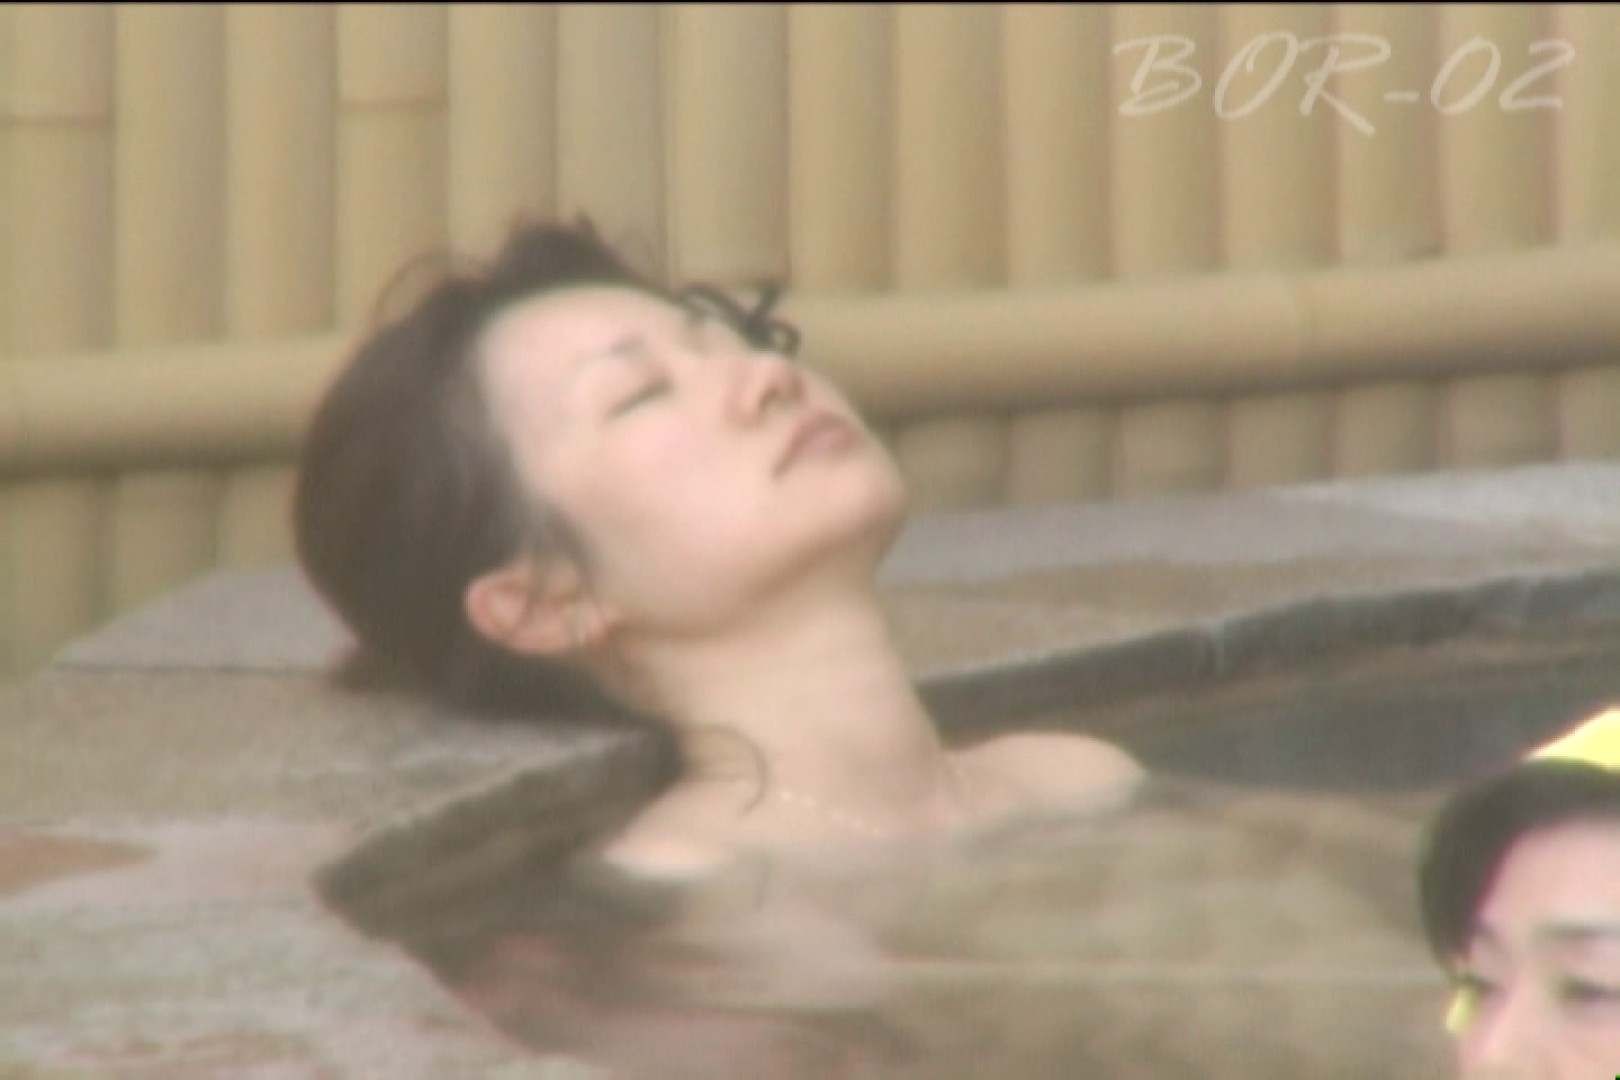 Aquaな露天風呂Vol.477 盗撮シリーズ | 露天風呂編  104PIX 39